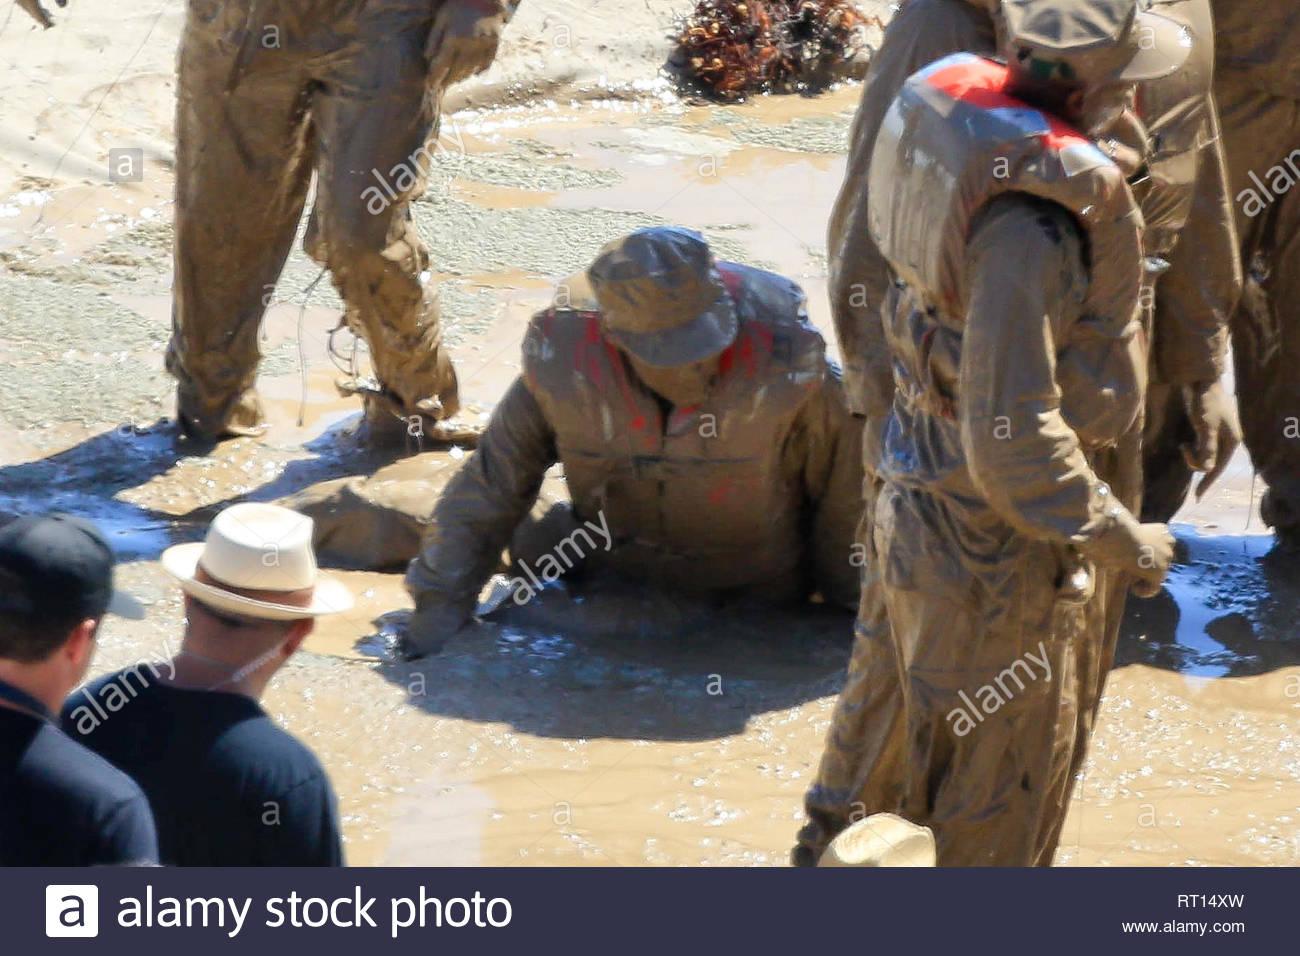 Malibu, CA - Bradley Cooper gets wet and dirty as he films